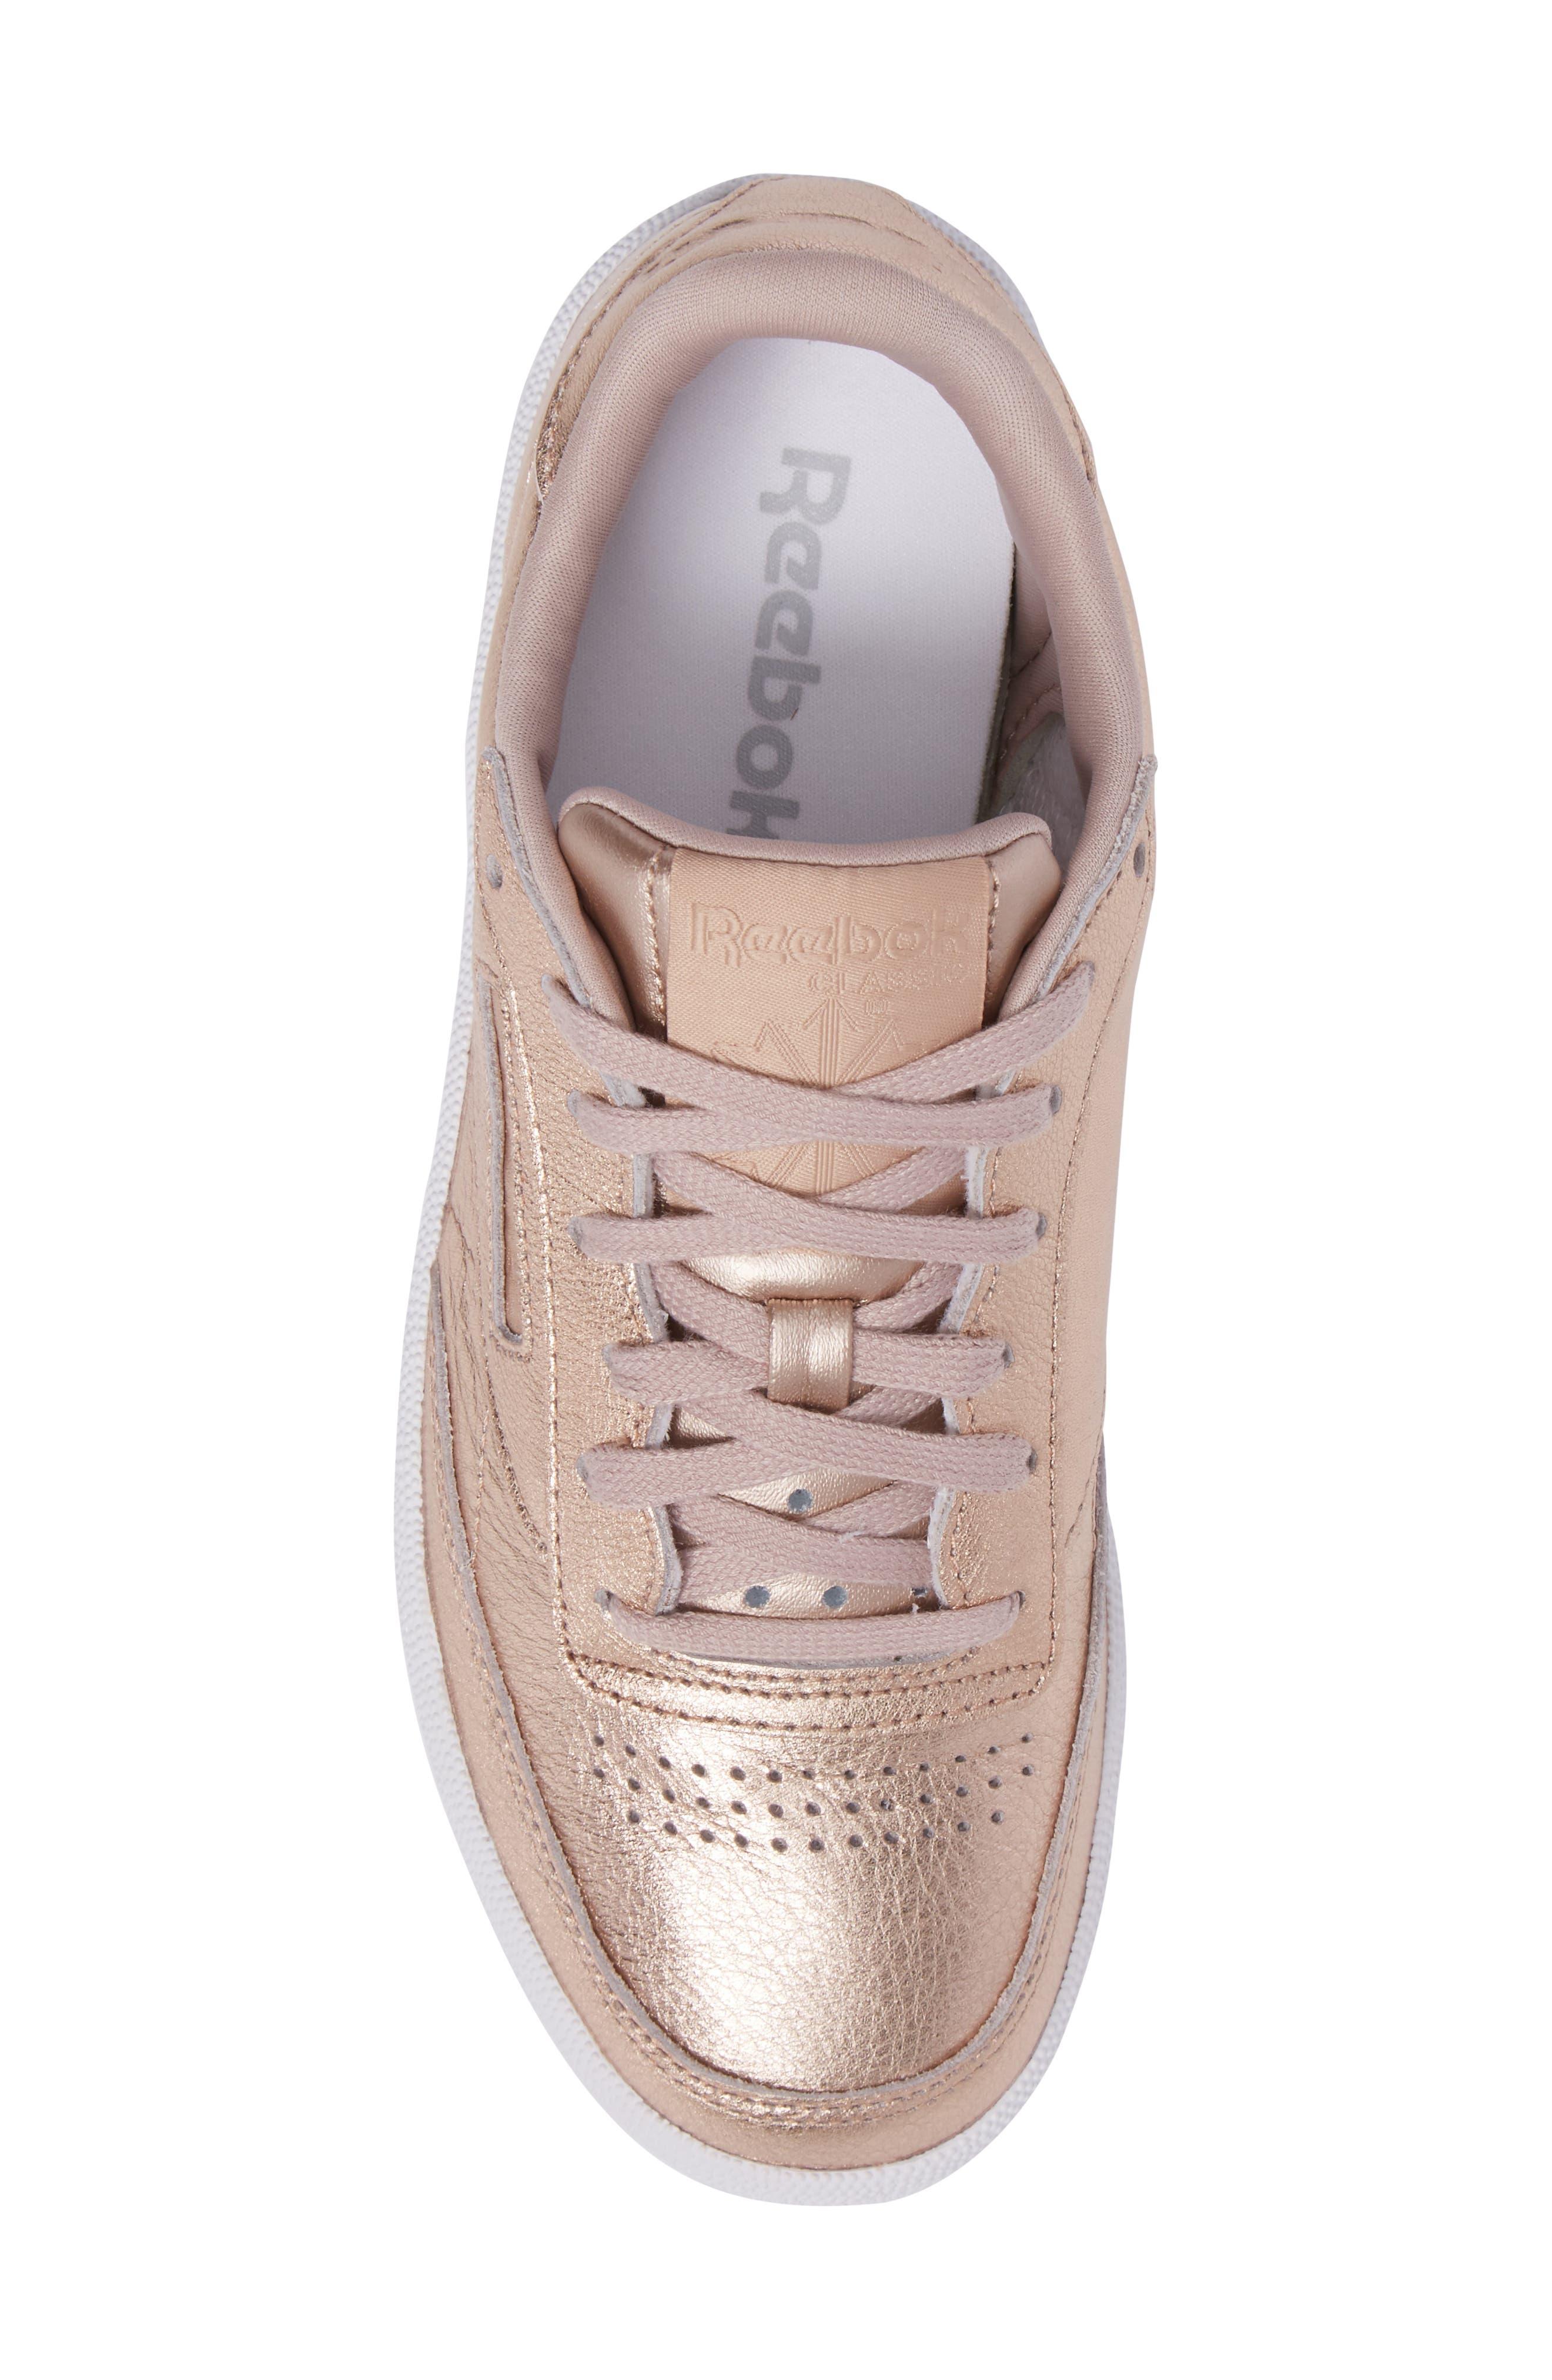 Club C 85 Sneaker,                             Alternate thumbnail 5, color,                             Peach/ White Pearl